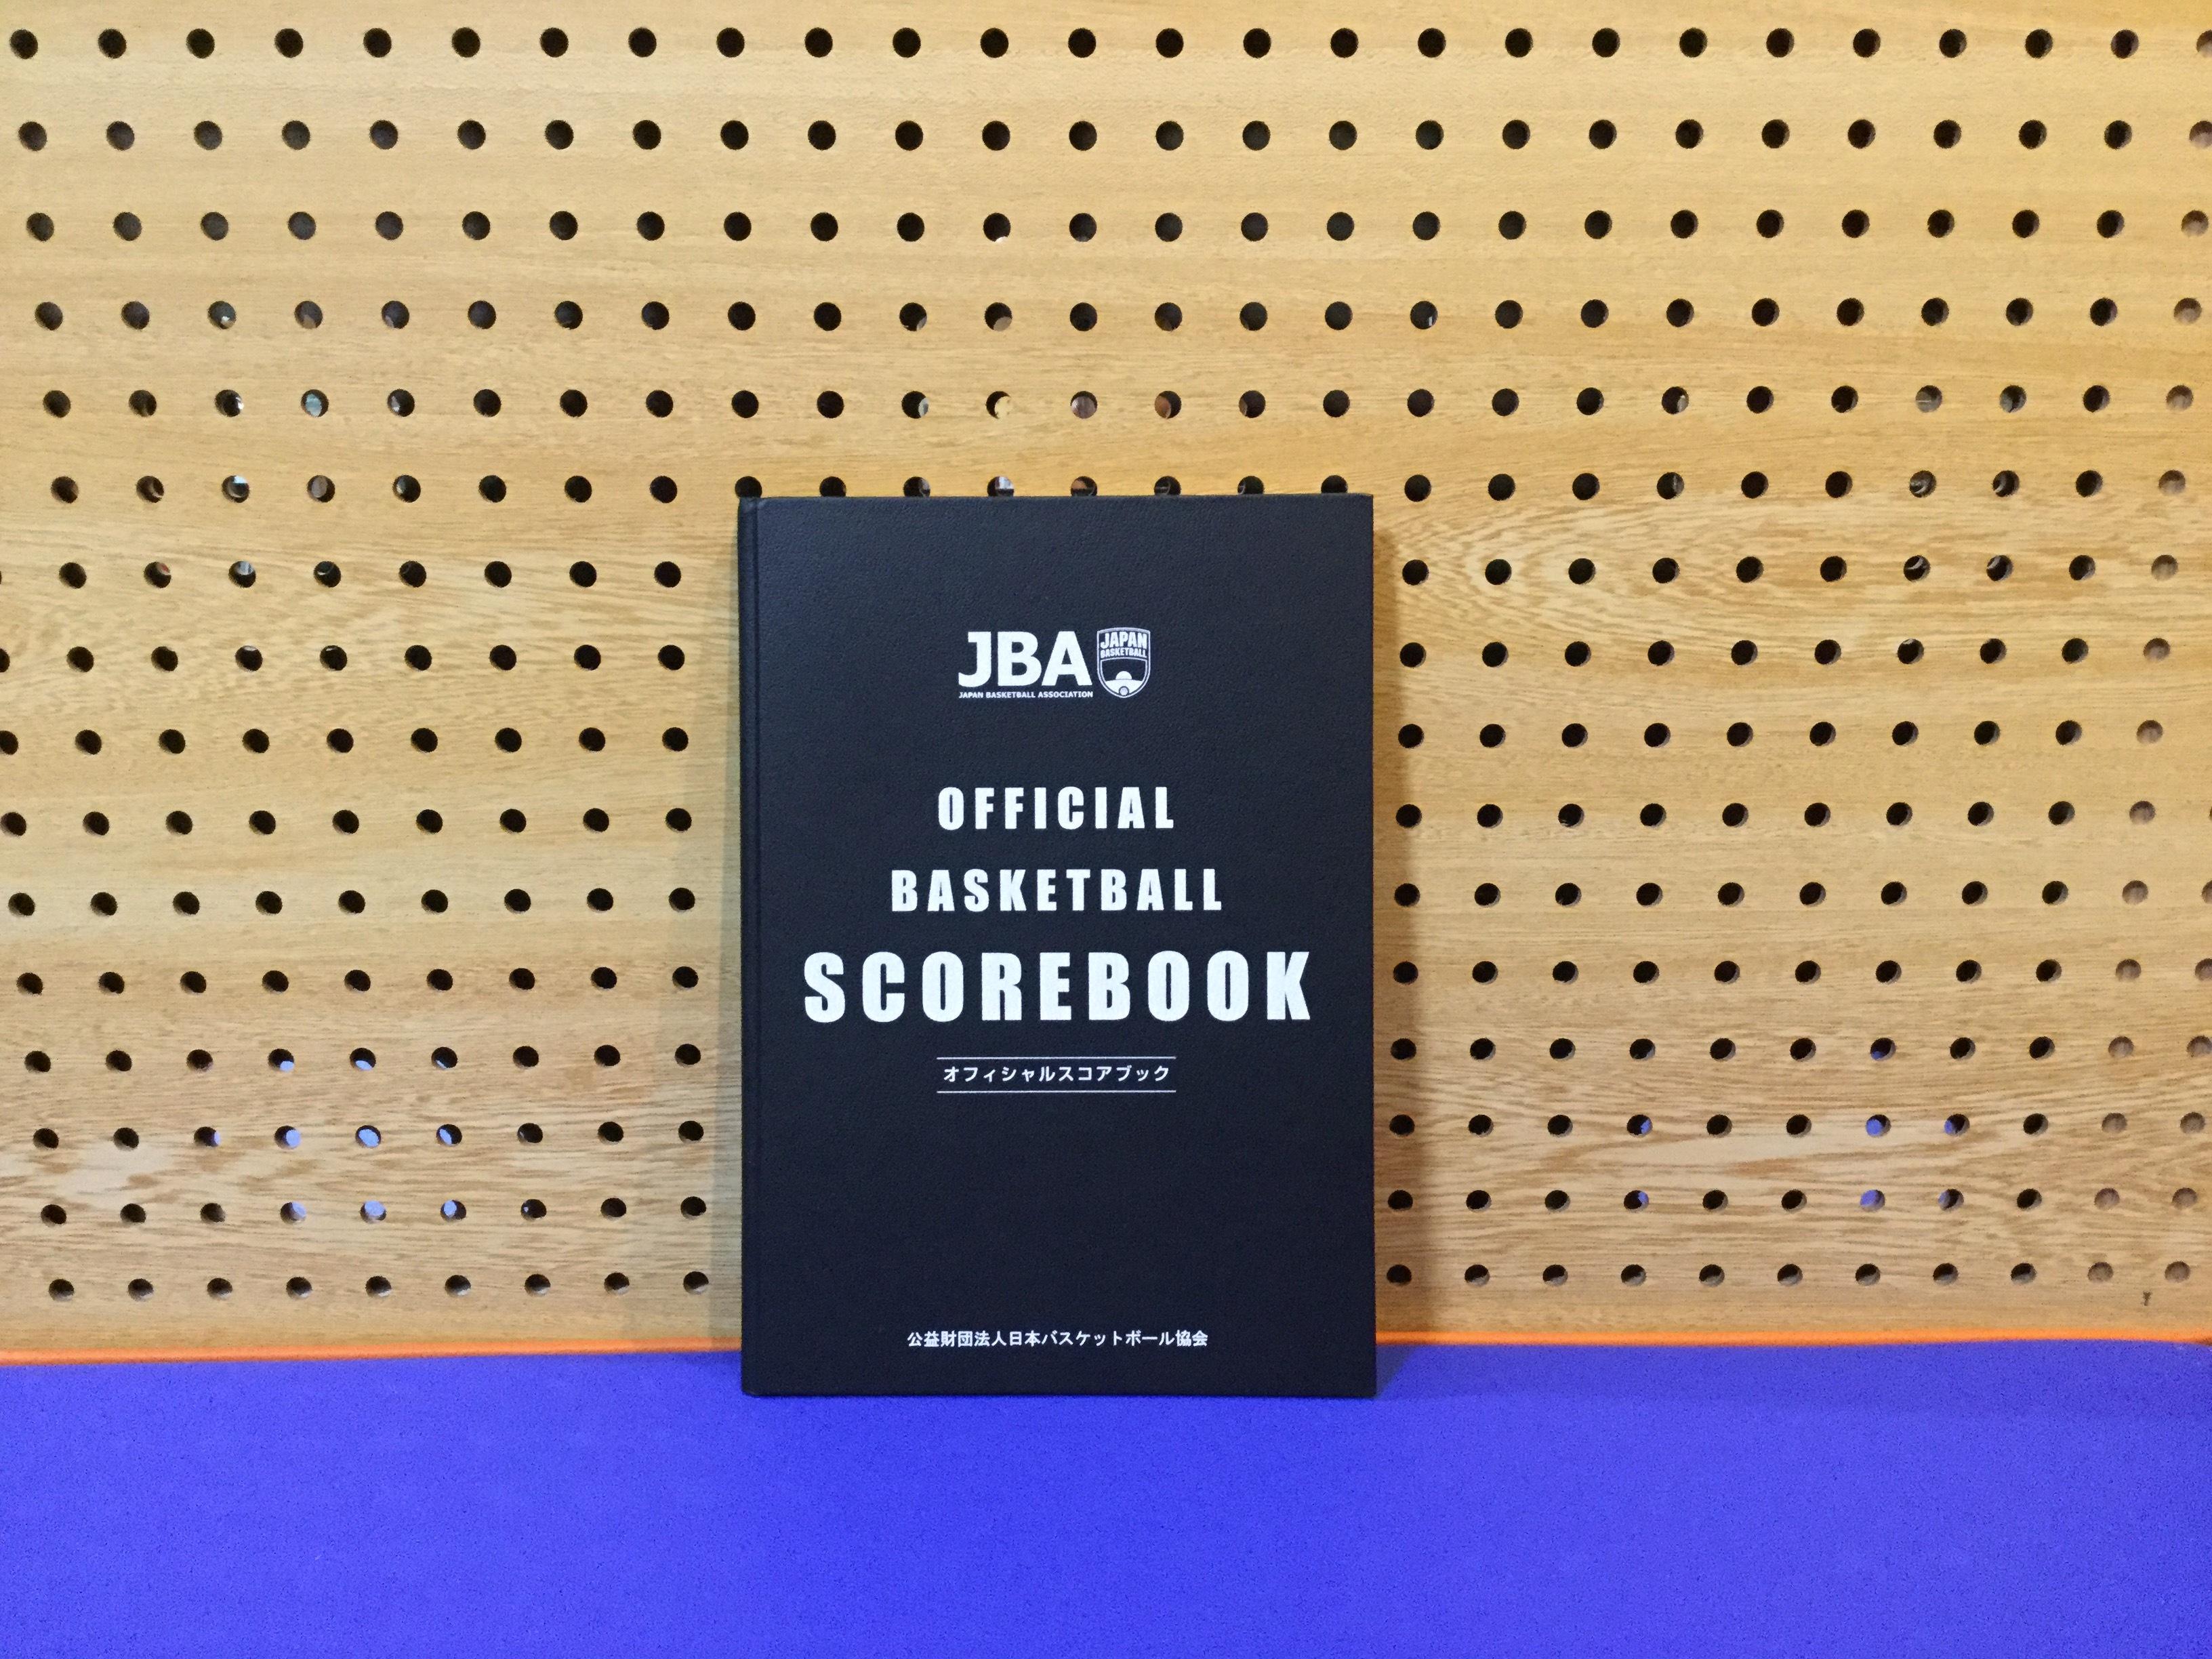 """JBA公認""オフィシャルスコアブック【公益財団法人日本バスケットボール協会】"